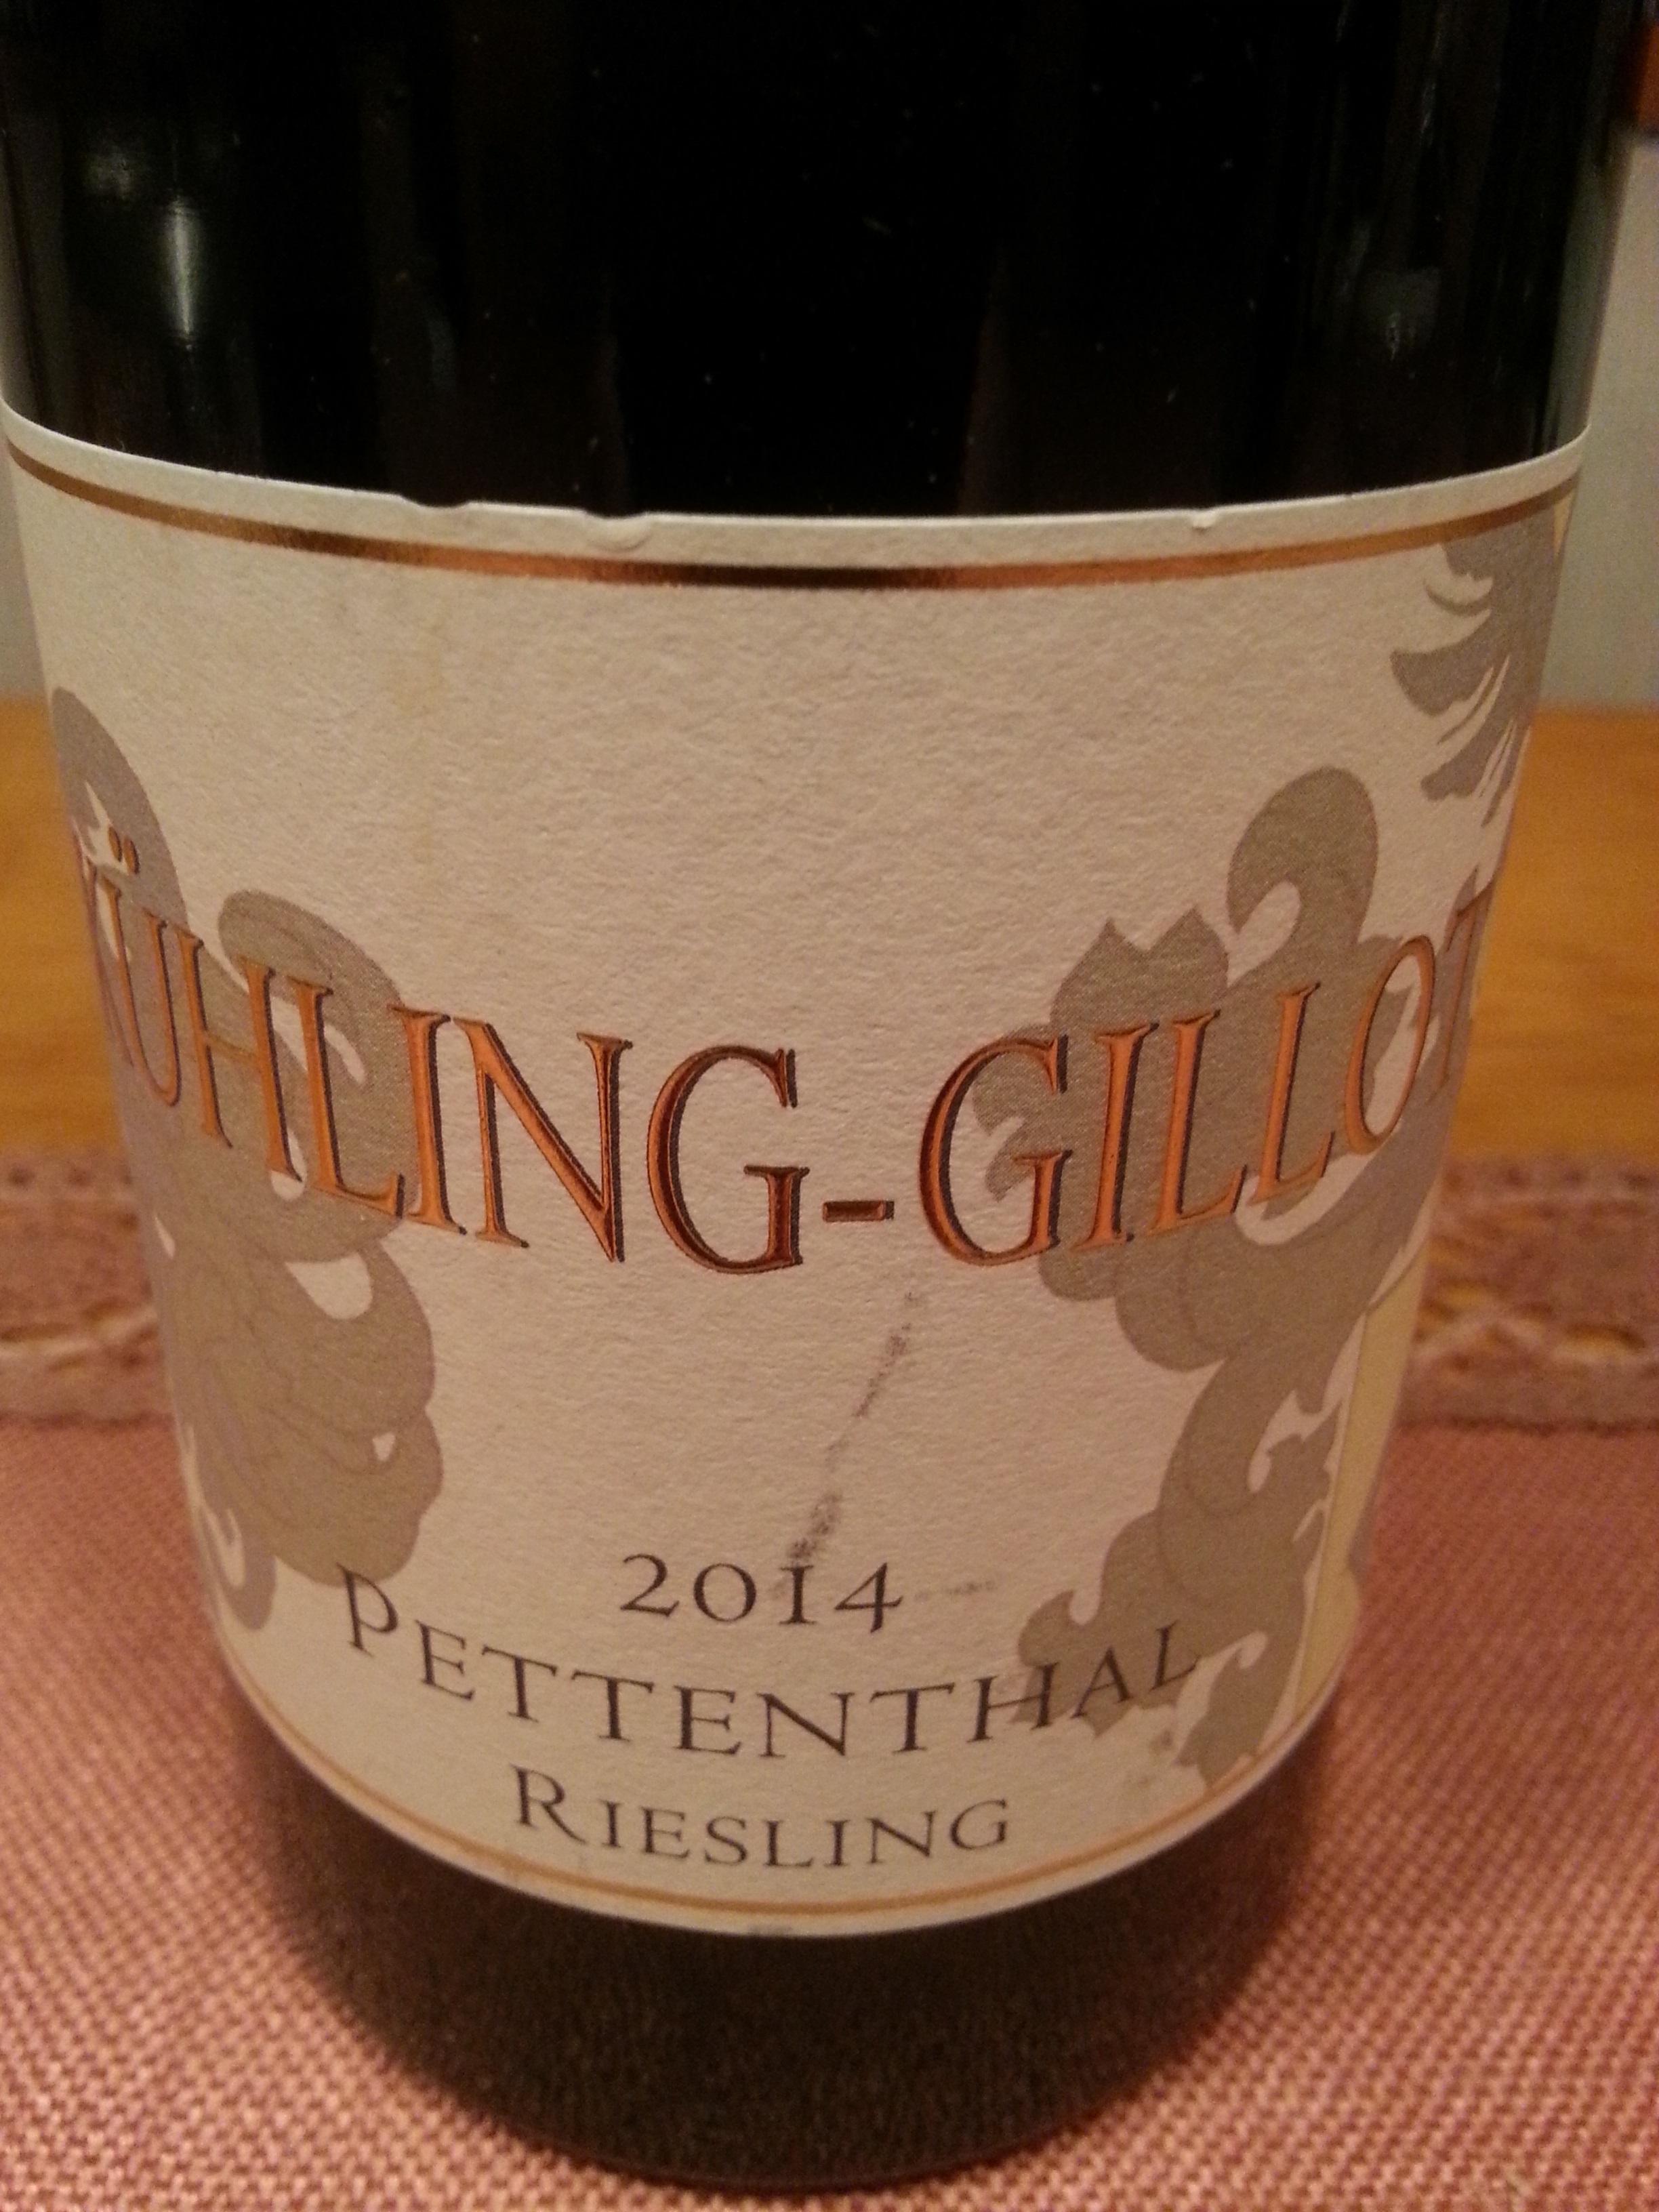 2014 Riesling Pettenthal GG   Kühling-Gillot